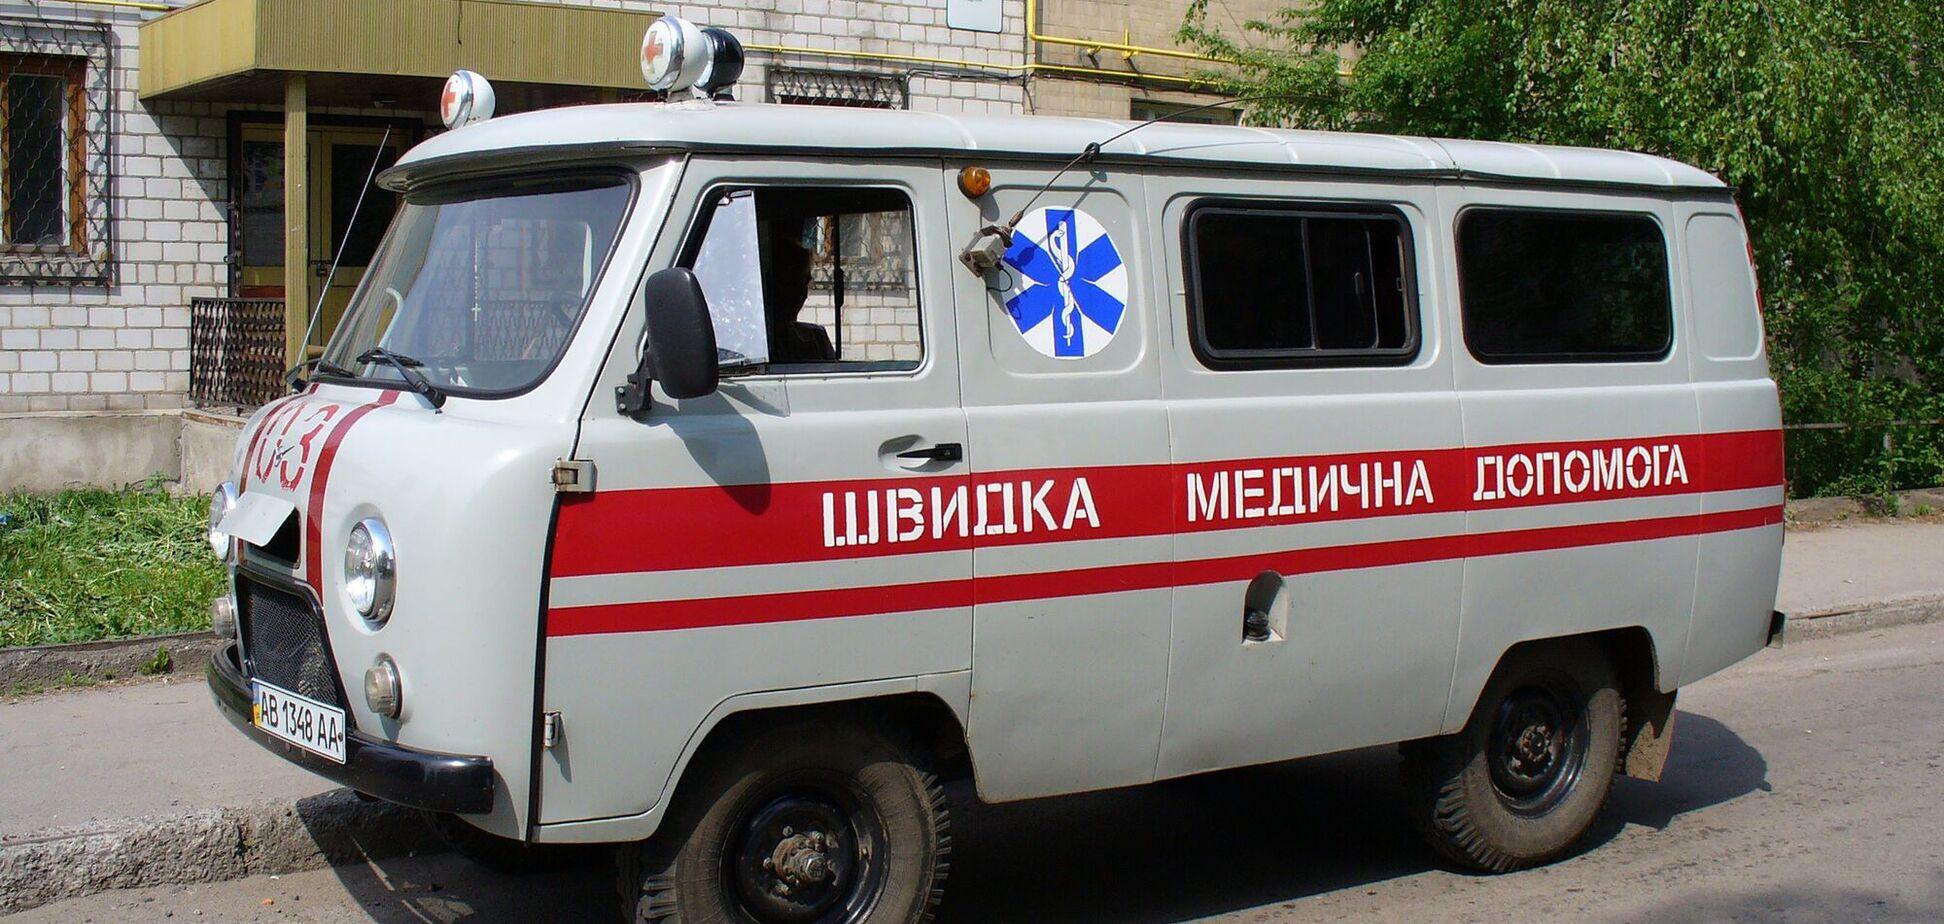 Машина скорой помощи марки УАЗ